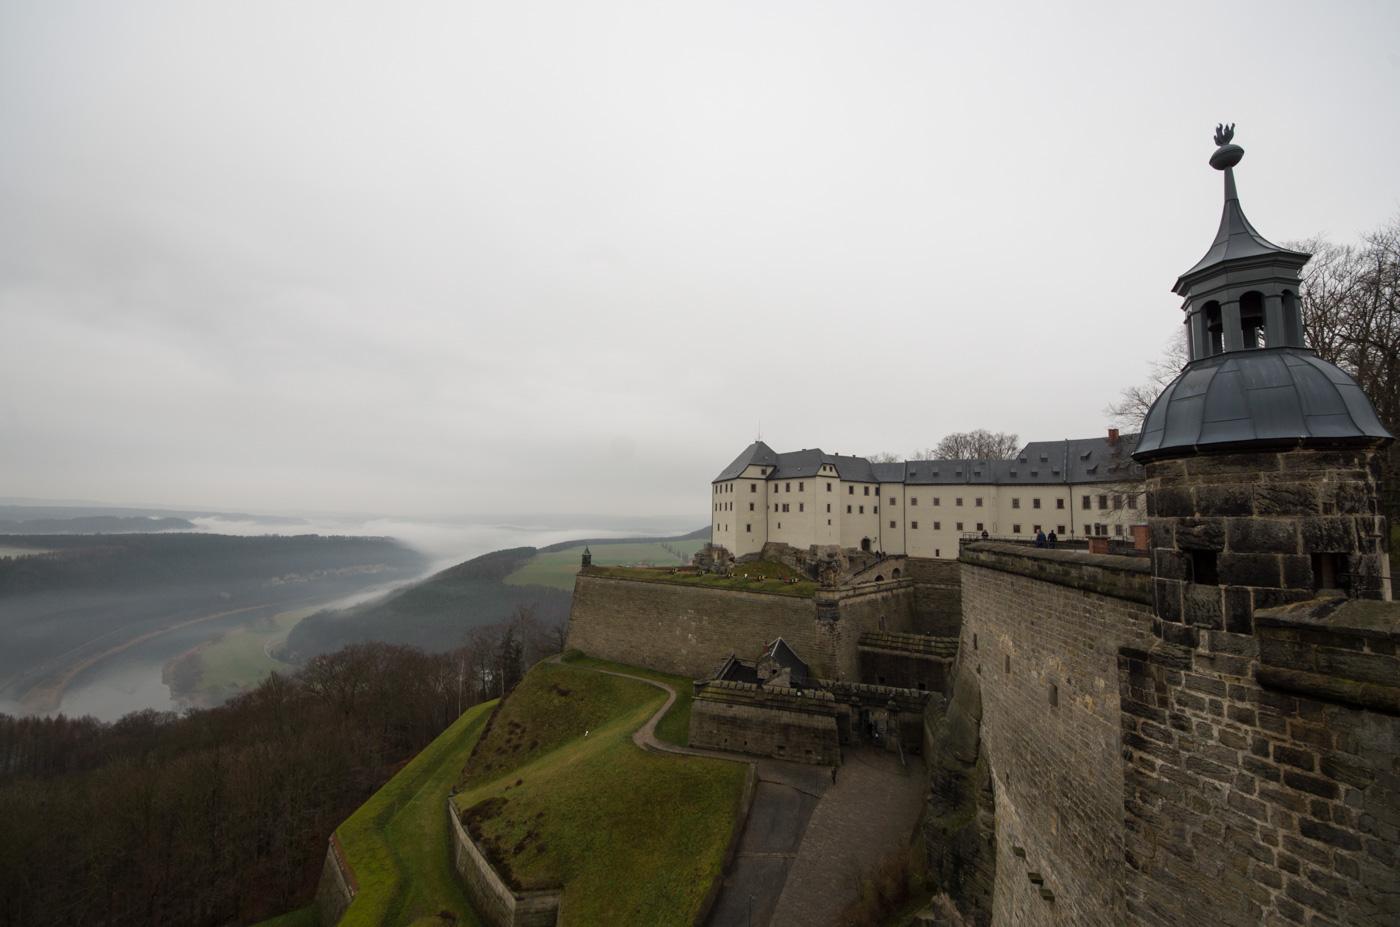 koenigsstein-fortress-saxony-4340